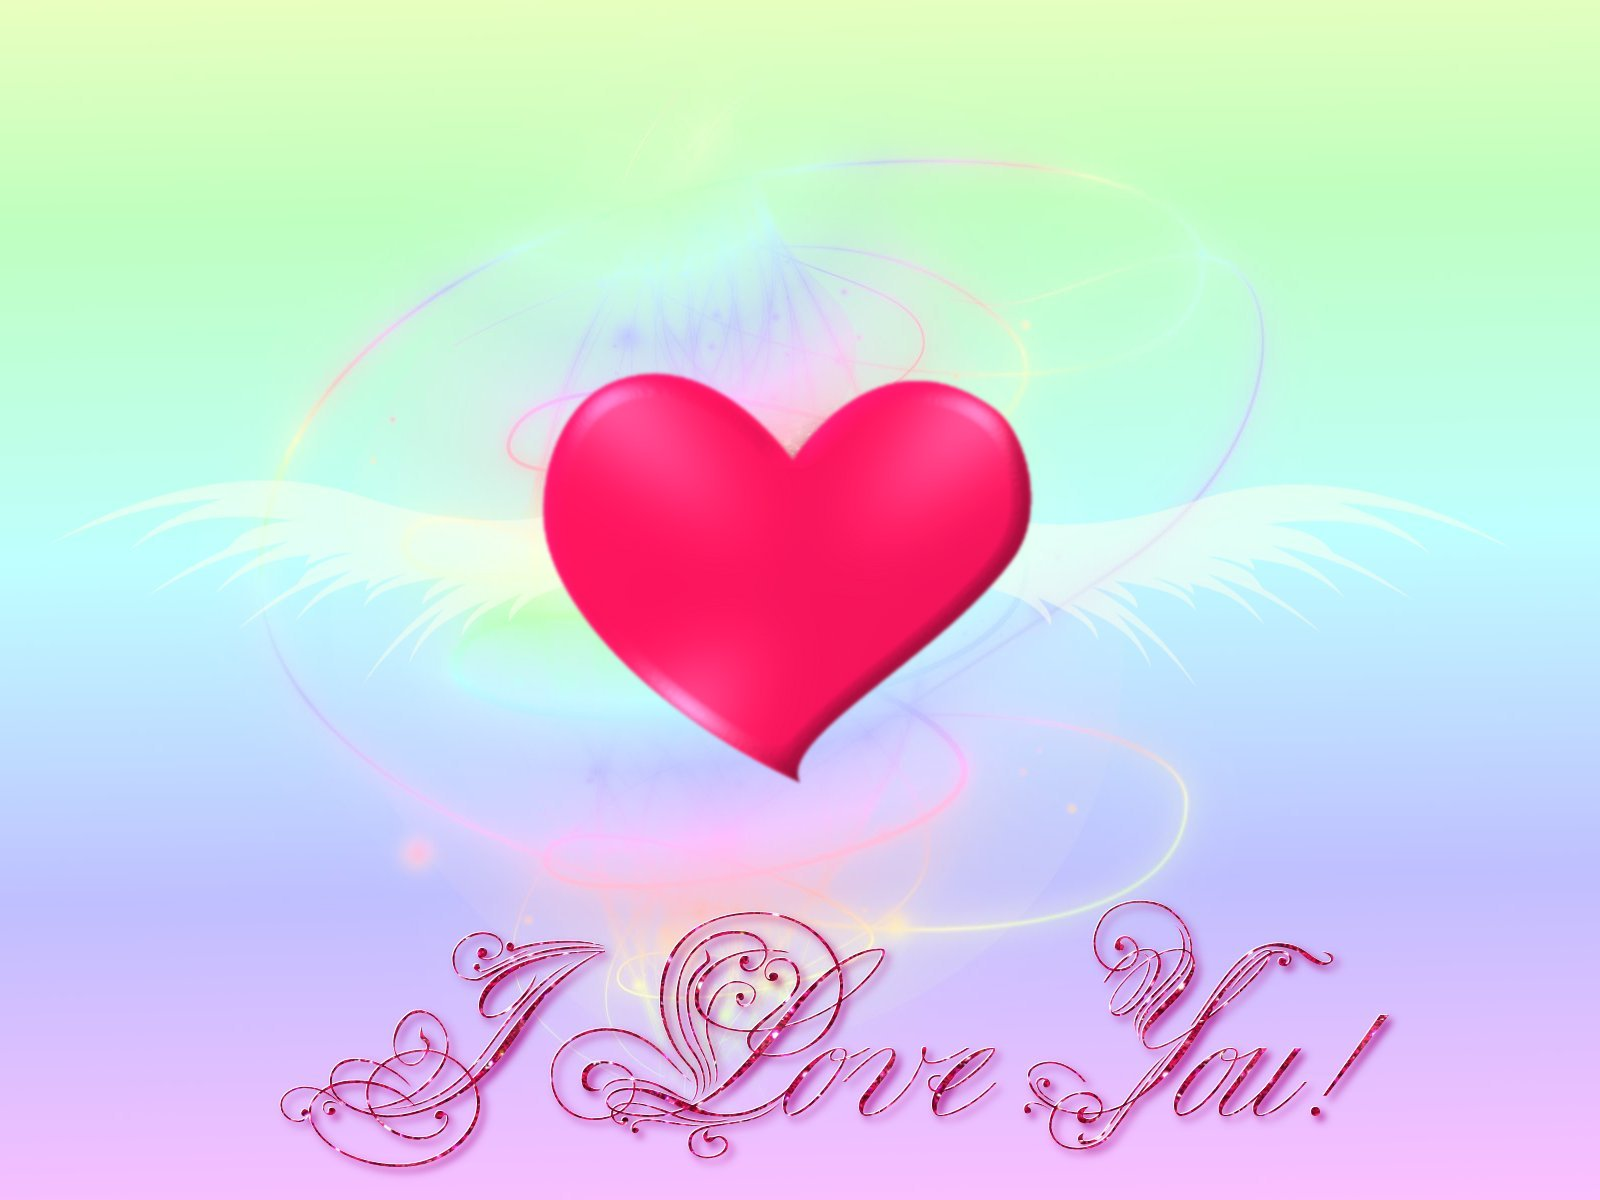 http://2.bp.blogspot.com/_C1zj0Z2wOog/TDxB-49kb2I/AAAAAAAAAlQ/H2kGdymkHHk/s1600/1600-i-love-you-wallpaper.jpg